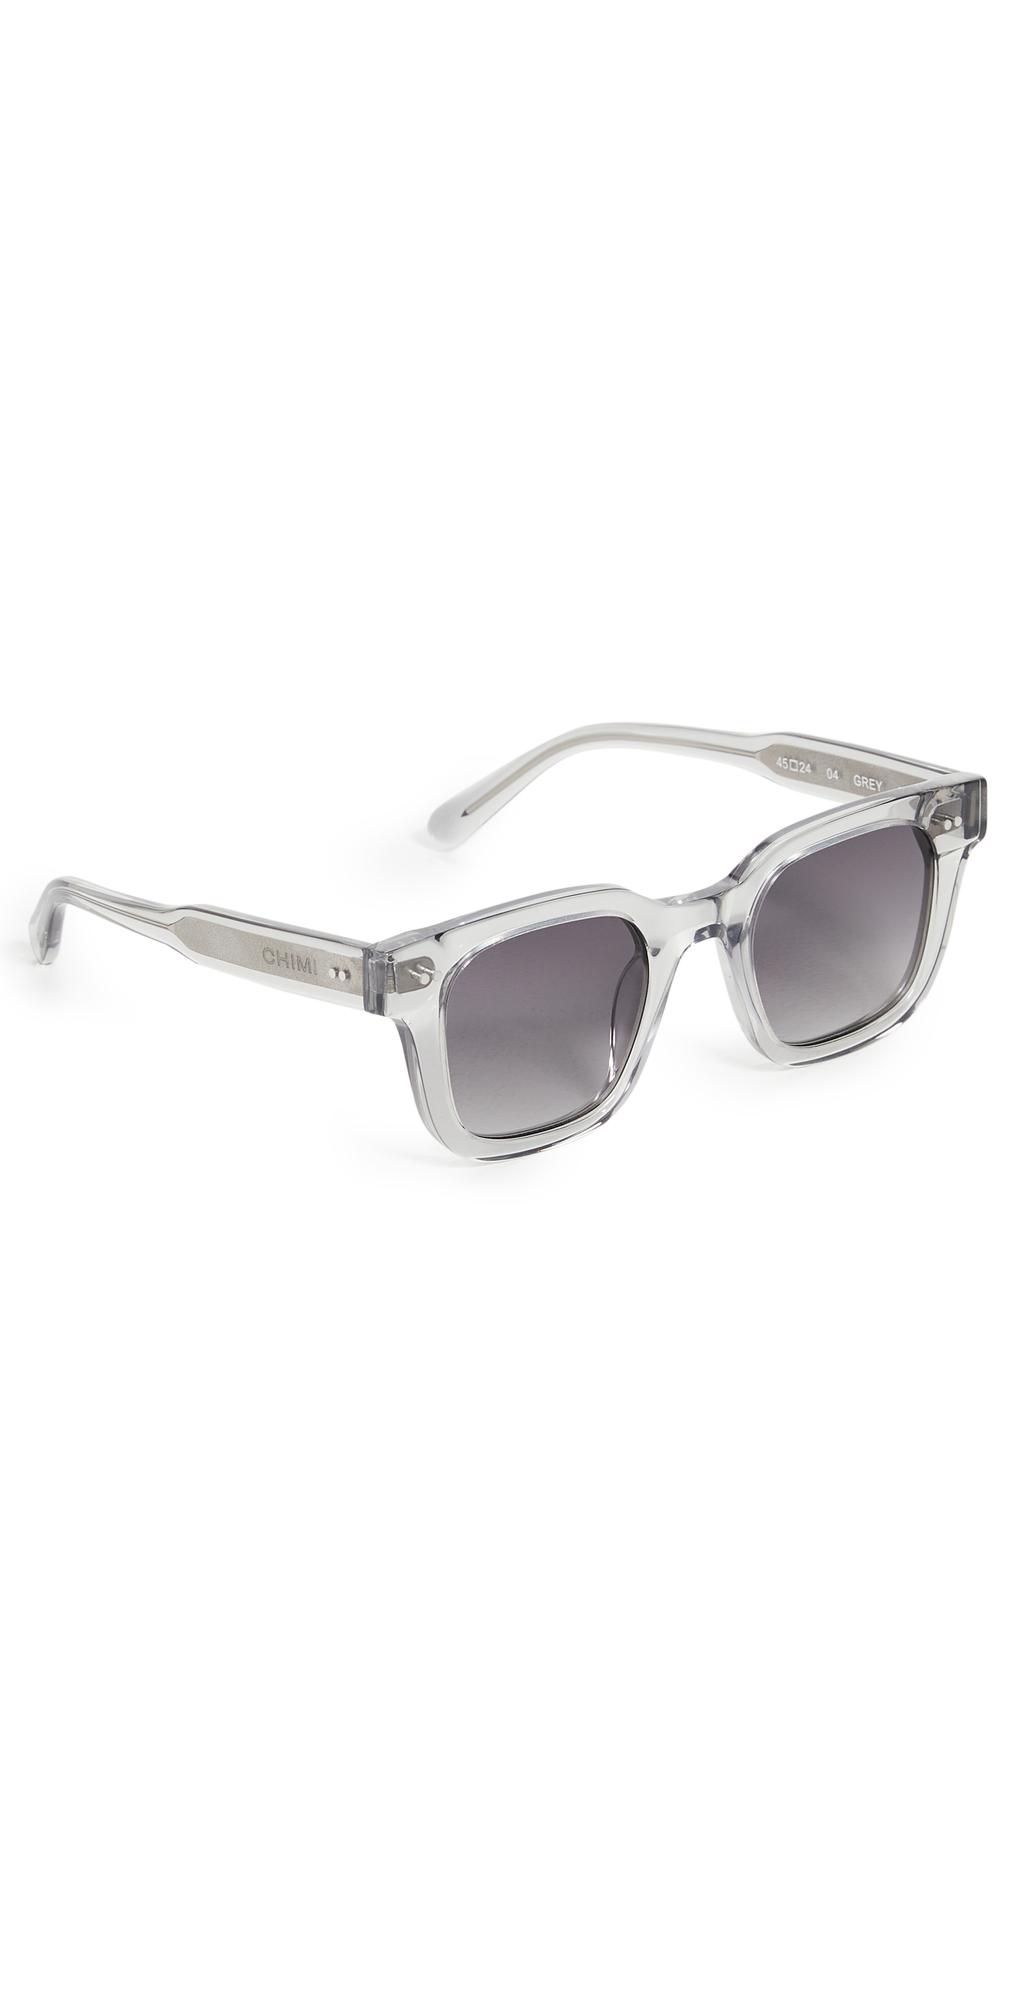 04 Sunglasses